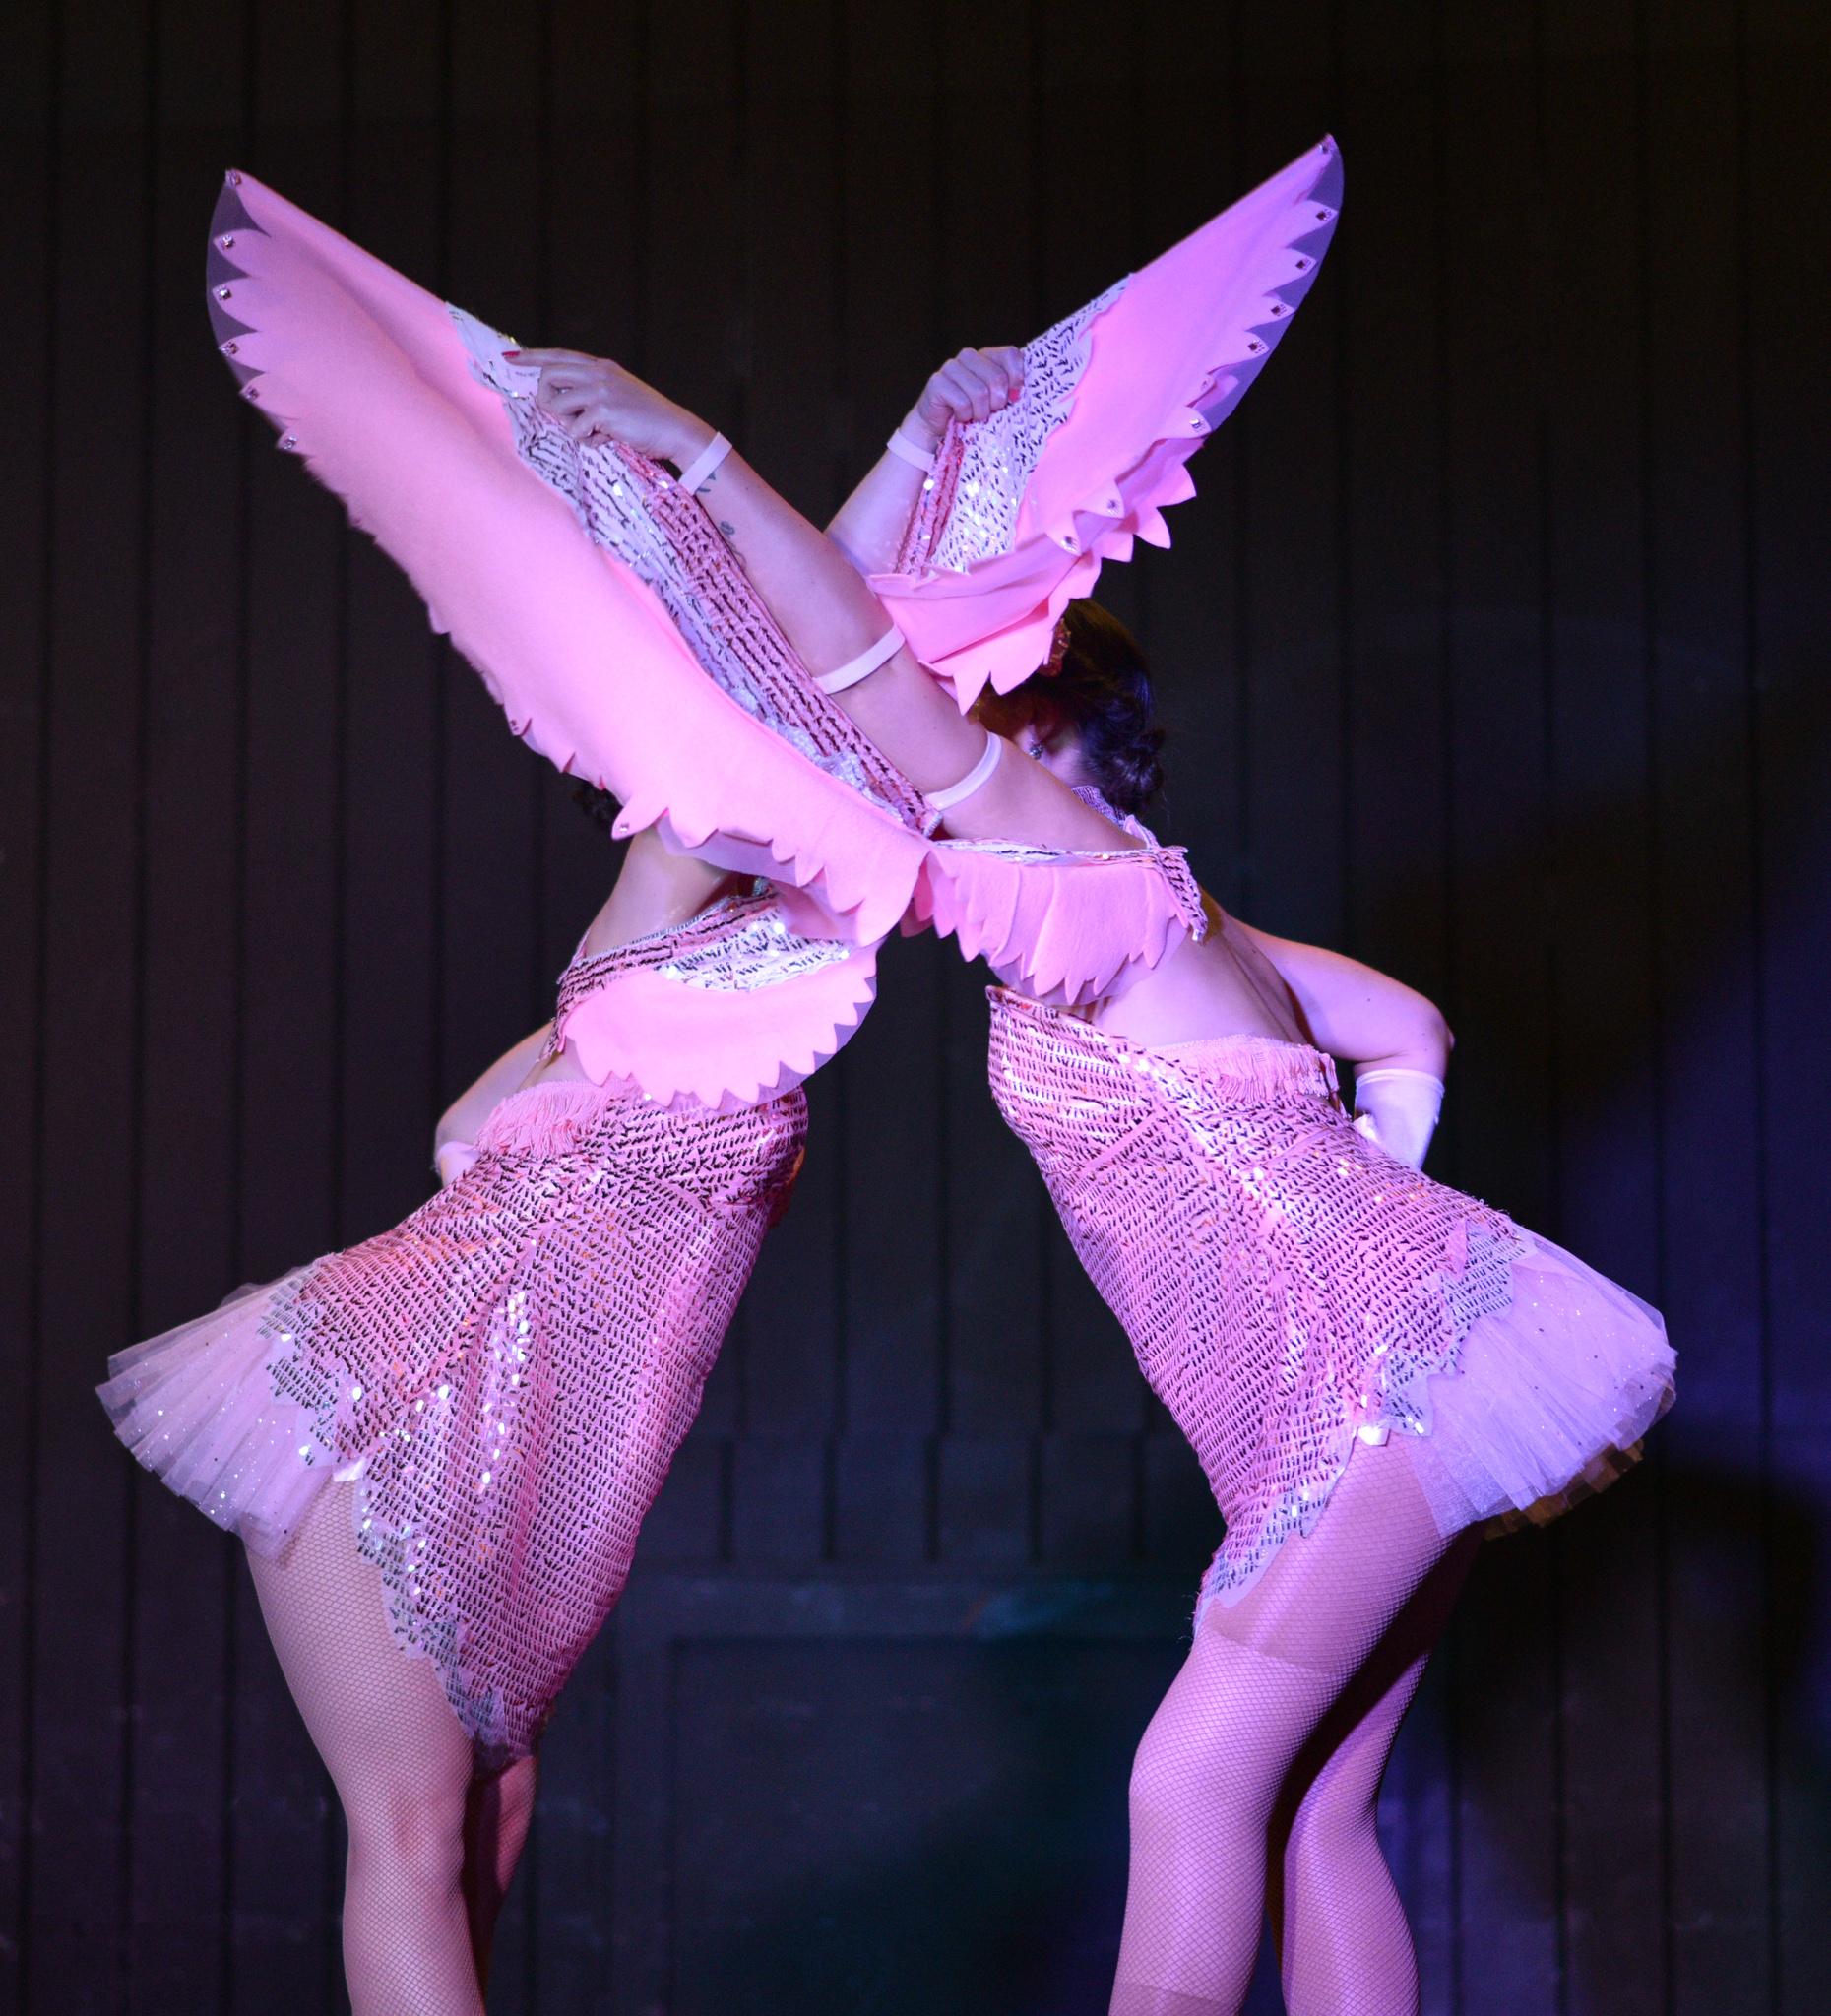 peter jennings The Razzle Dazzlers flamingo follies